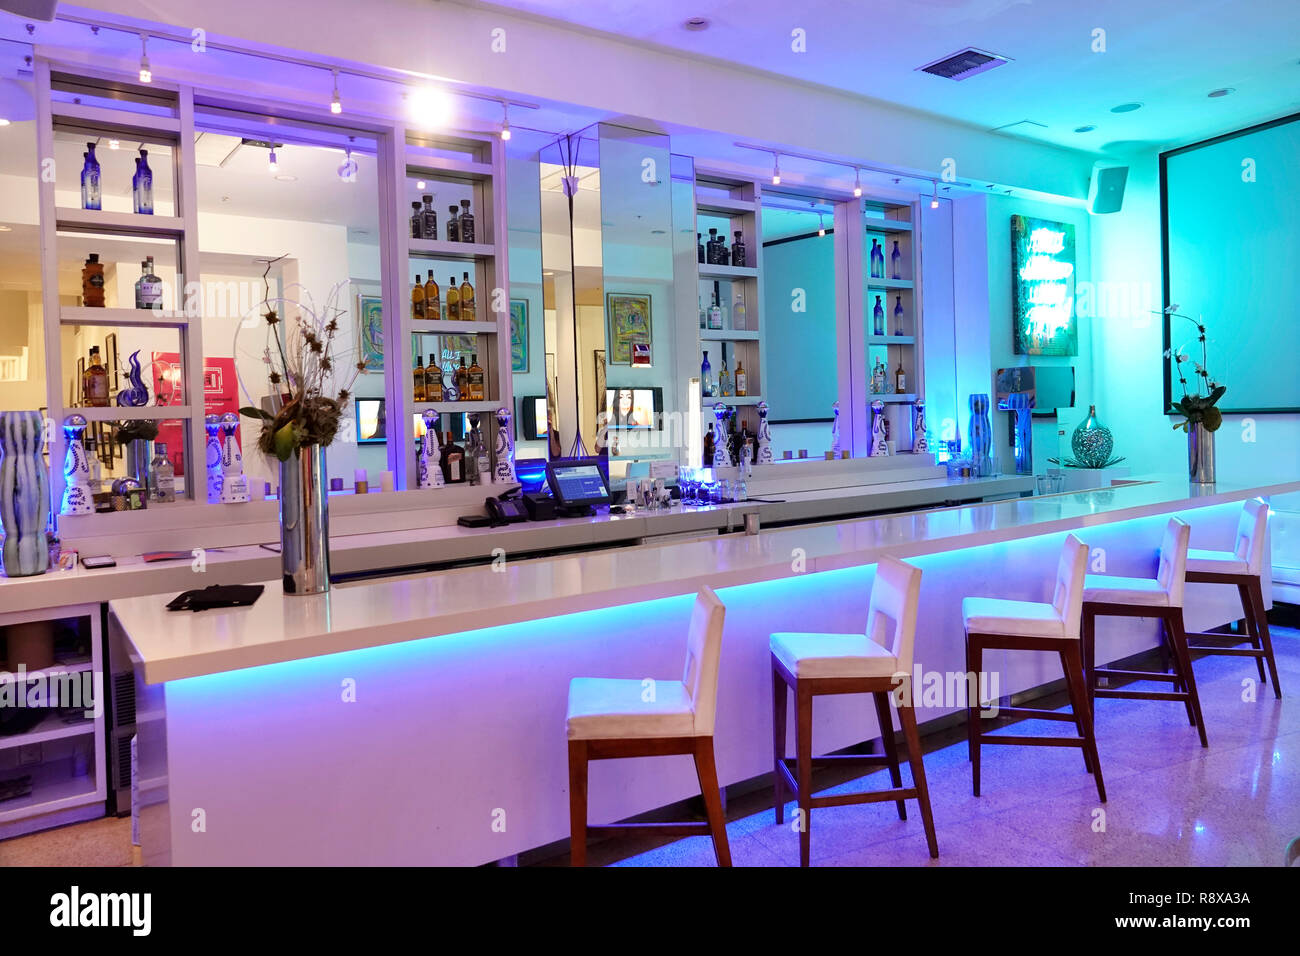 Miami Beach Florida Collins Avenue Sagamore hotel lounge bar - Stock Image